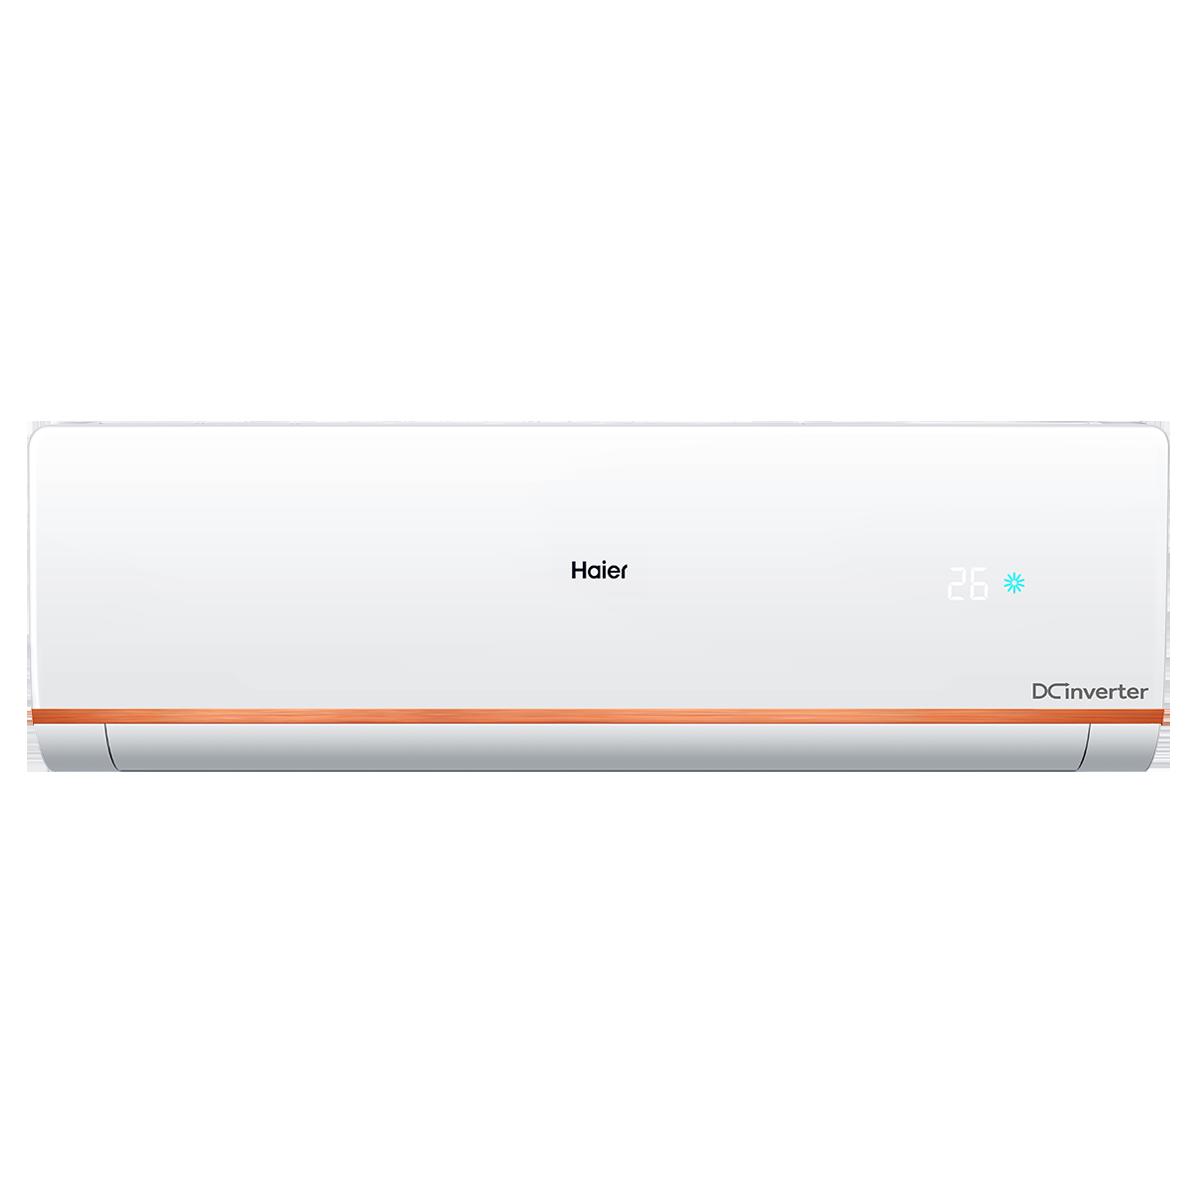 Haier CleanCool Kuadra 1 Ton 4 Star Inverter Split AC (2 Row Copper Tube Condenser, HSU12C-TCB4B(INV), White)_1